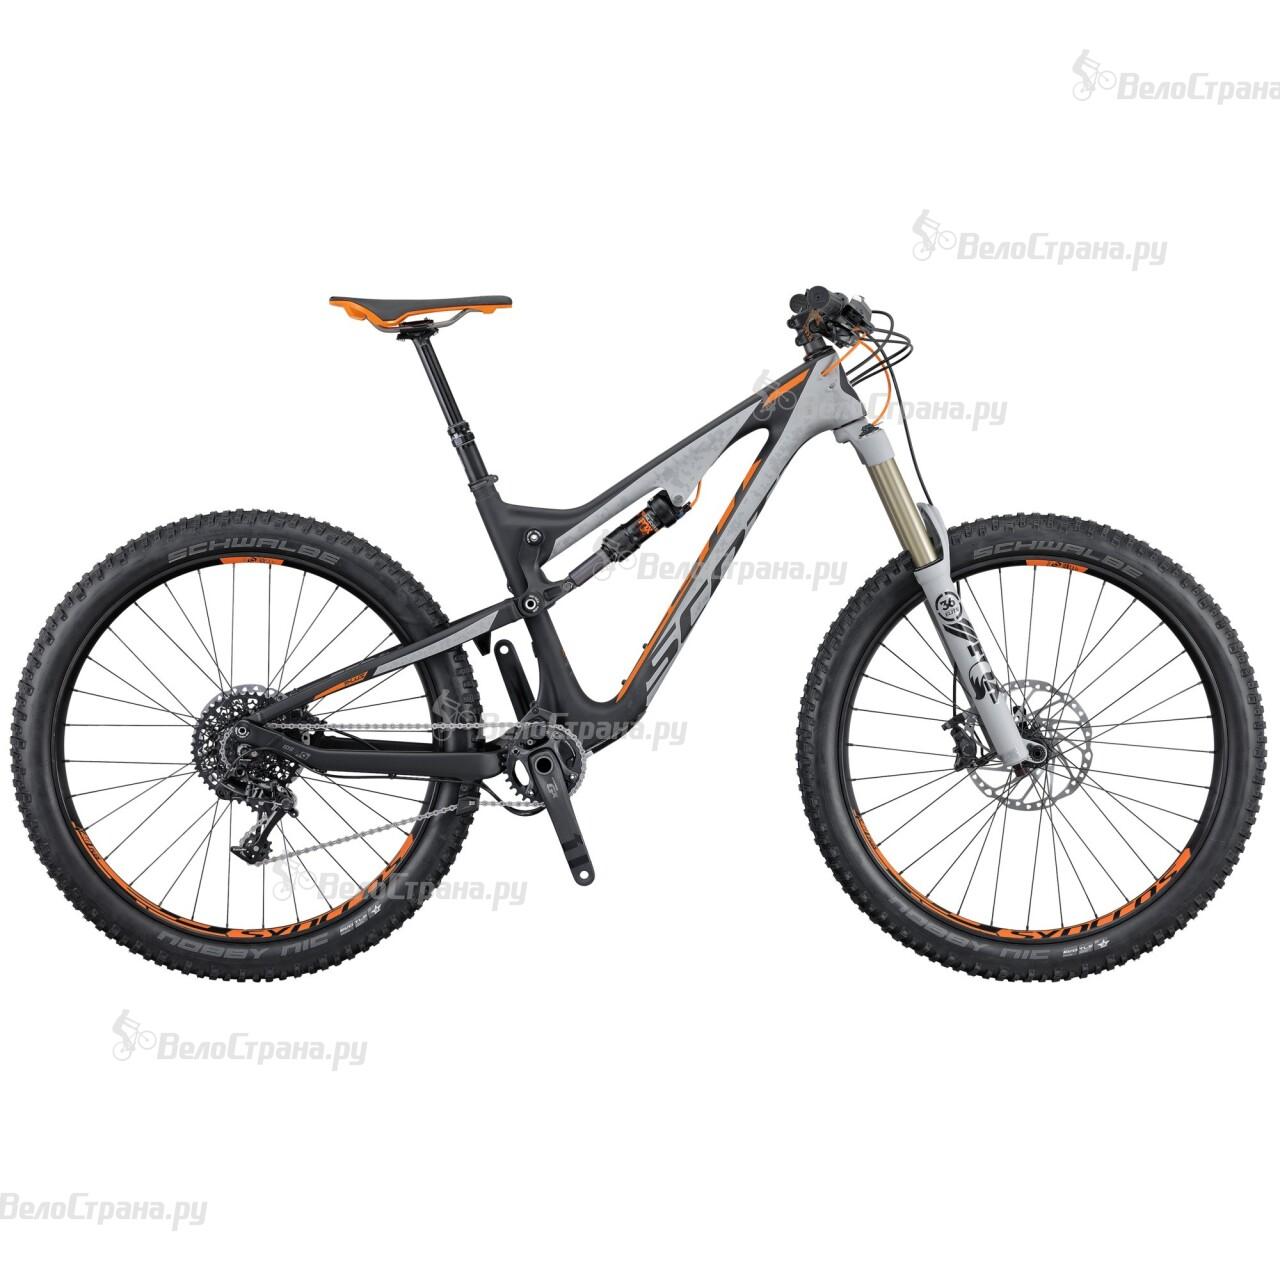 Велосипед Scott Genius LT 710 Plus (2016) yt807 304 stainless steel phillios self tapping screws cross recessed pan head tapping screw m5 xmm free shipping